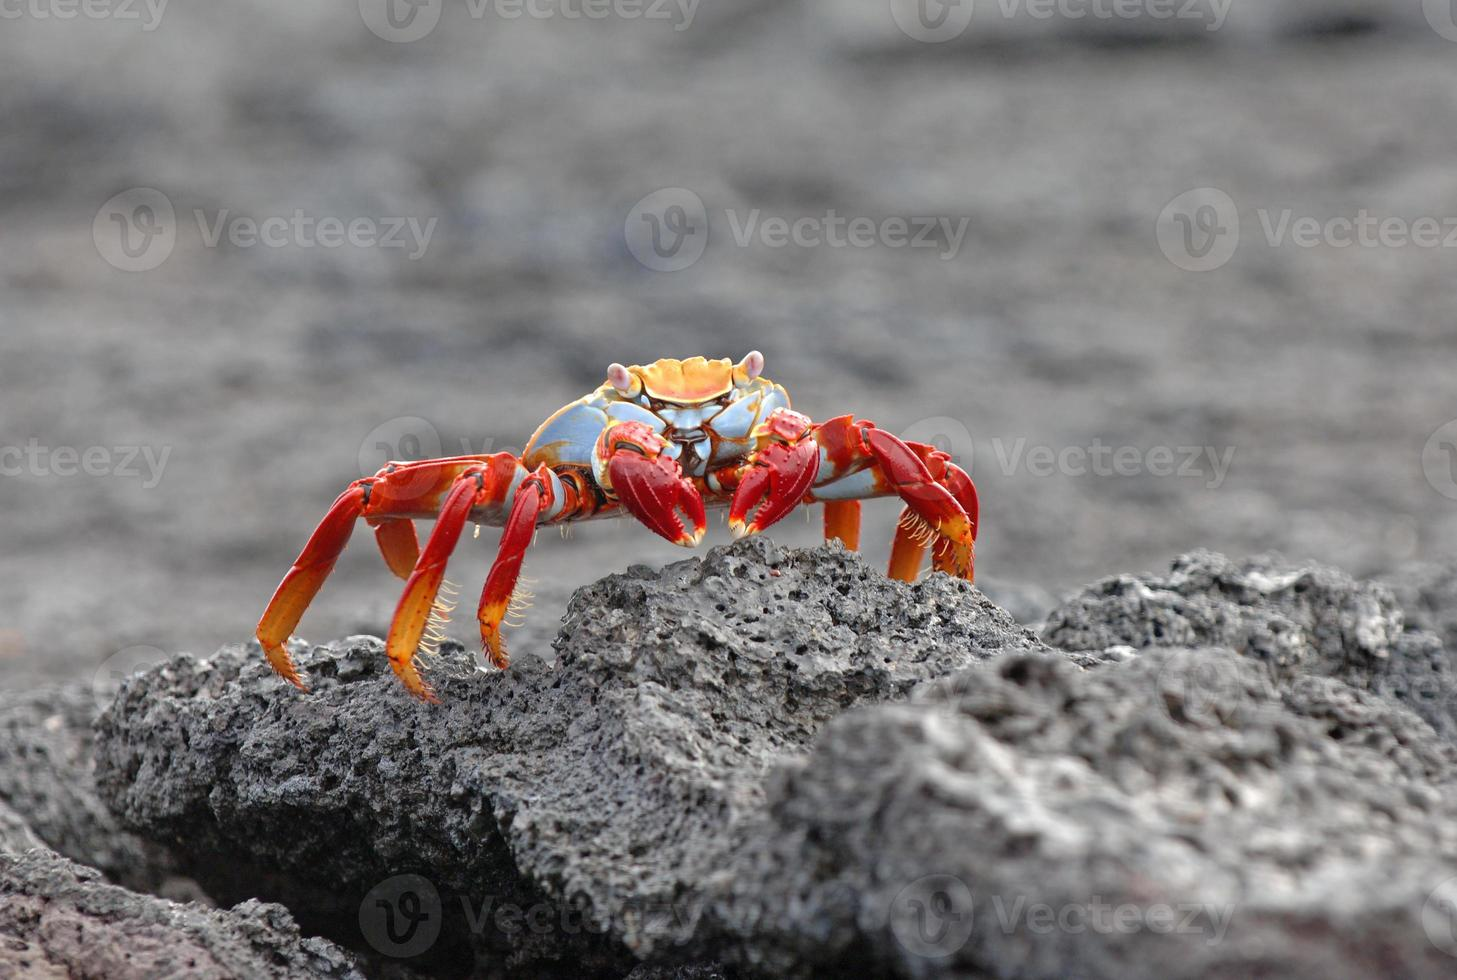 cangrejo sally lightfoot, islas galápagos, ecuador foto